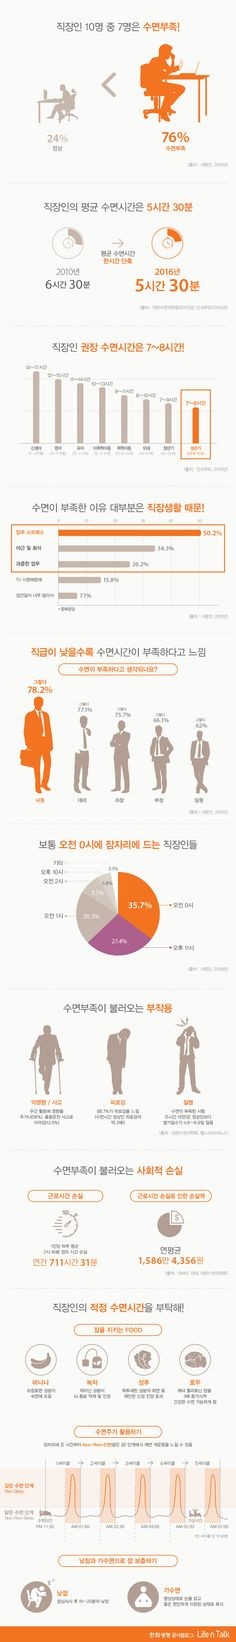 [Infographic] 직장인 수면부족에 관한 인포그래픽